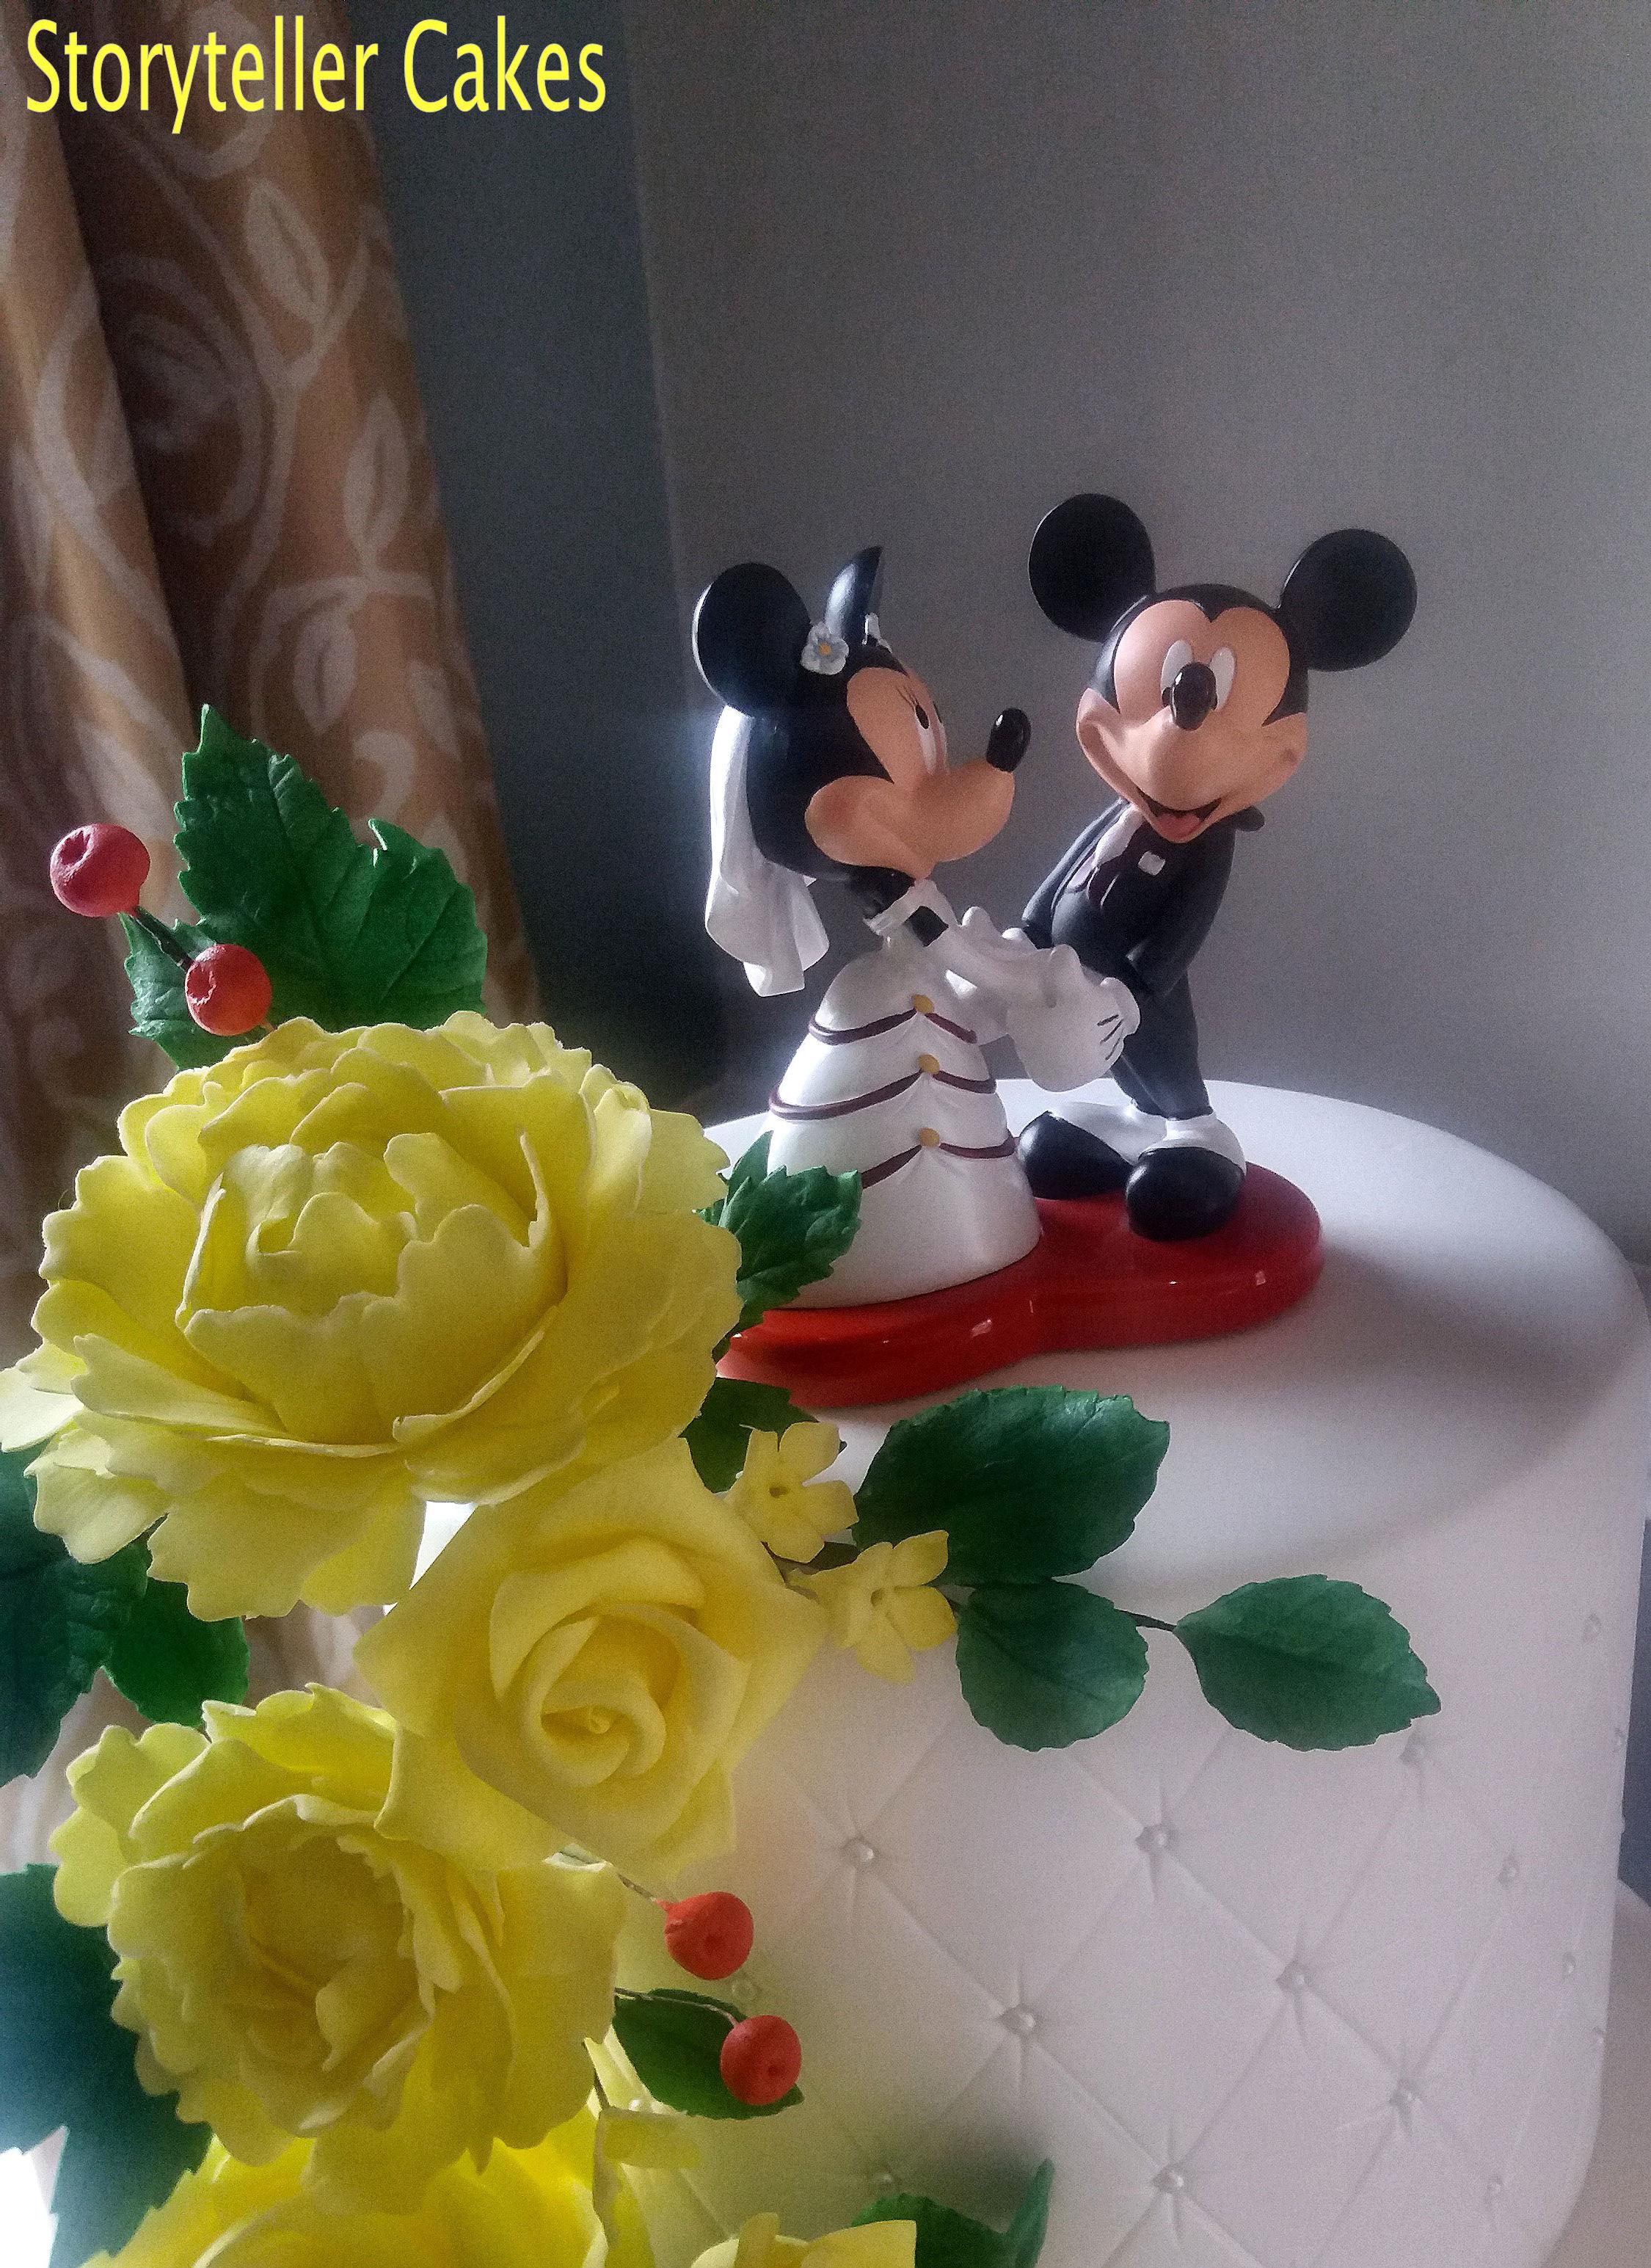 Disney Cake 4.jpg